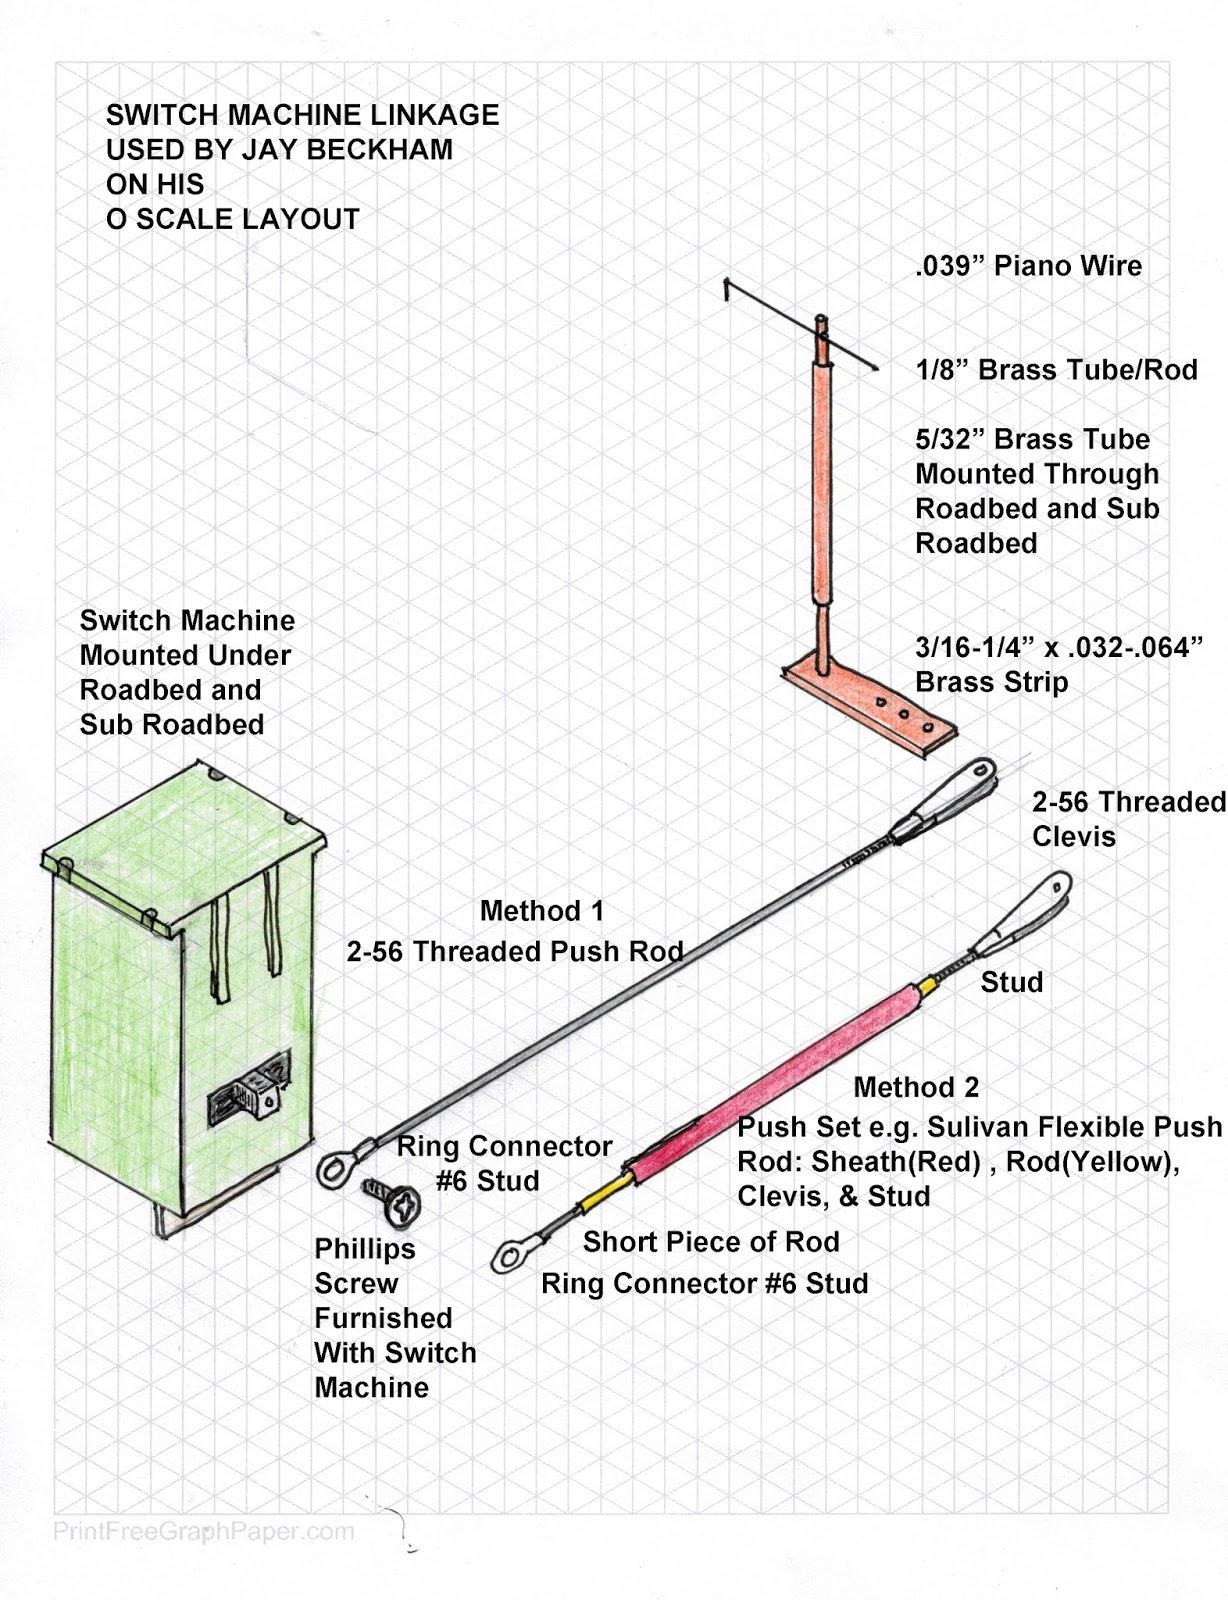 Wiring Tortoise Switch Machines 2 Together Automotive Diagram For Controls Machine Installation Model Railroad Hobbyist Magazine Rh Com Control